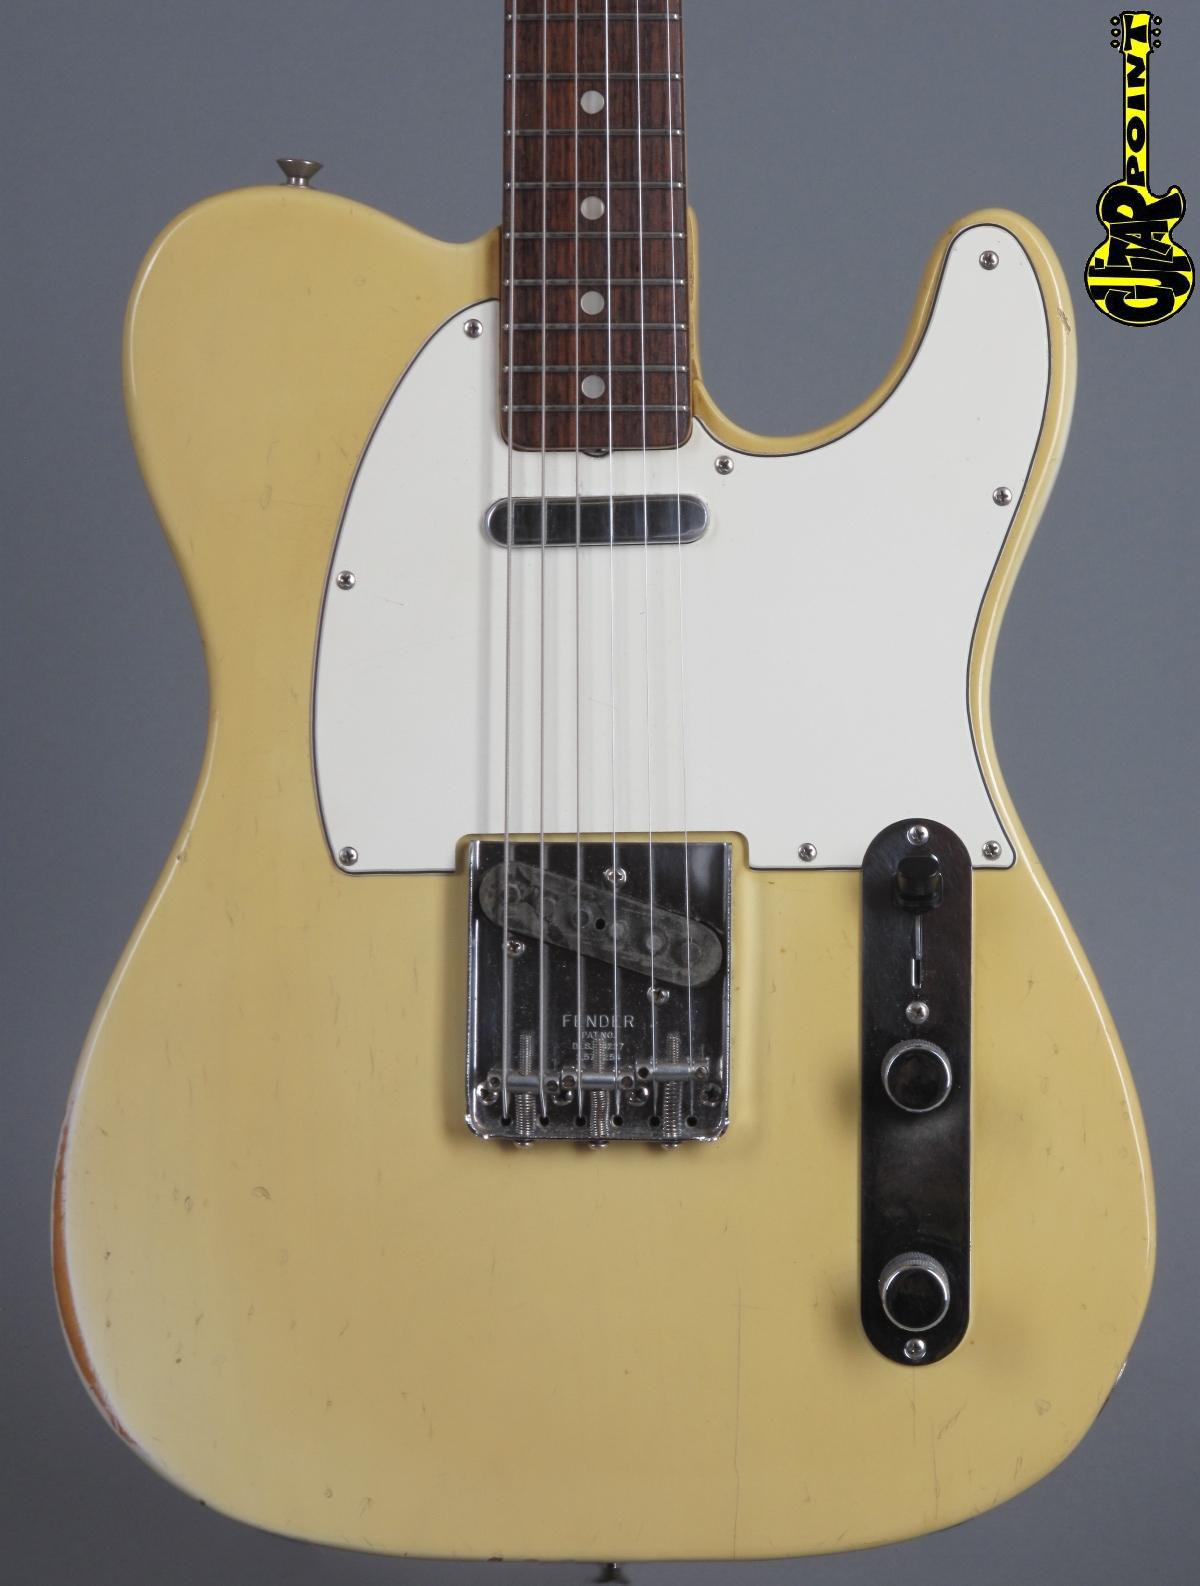 1971 Fender Telecaster -  Blond    ...only 3,26 Kg!